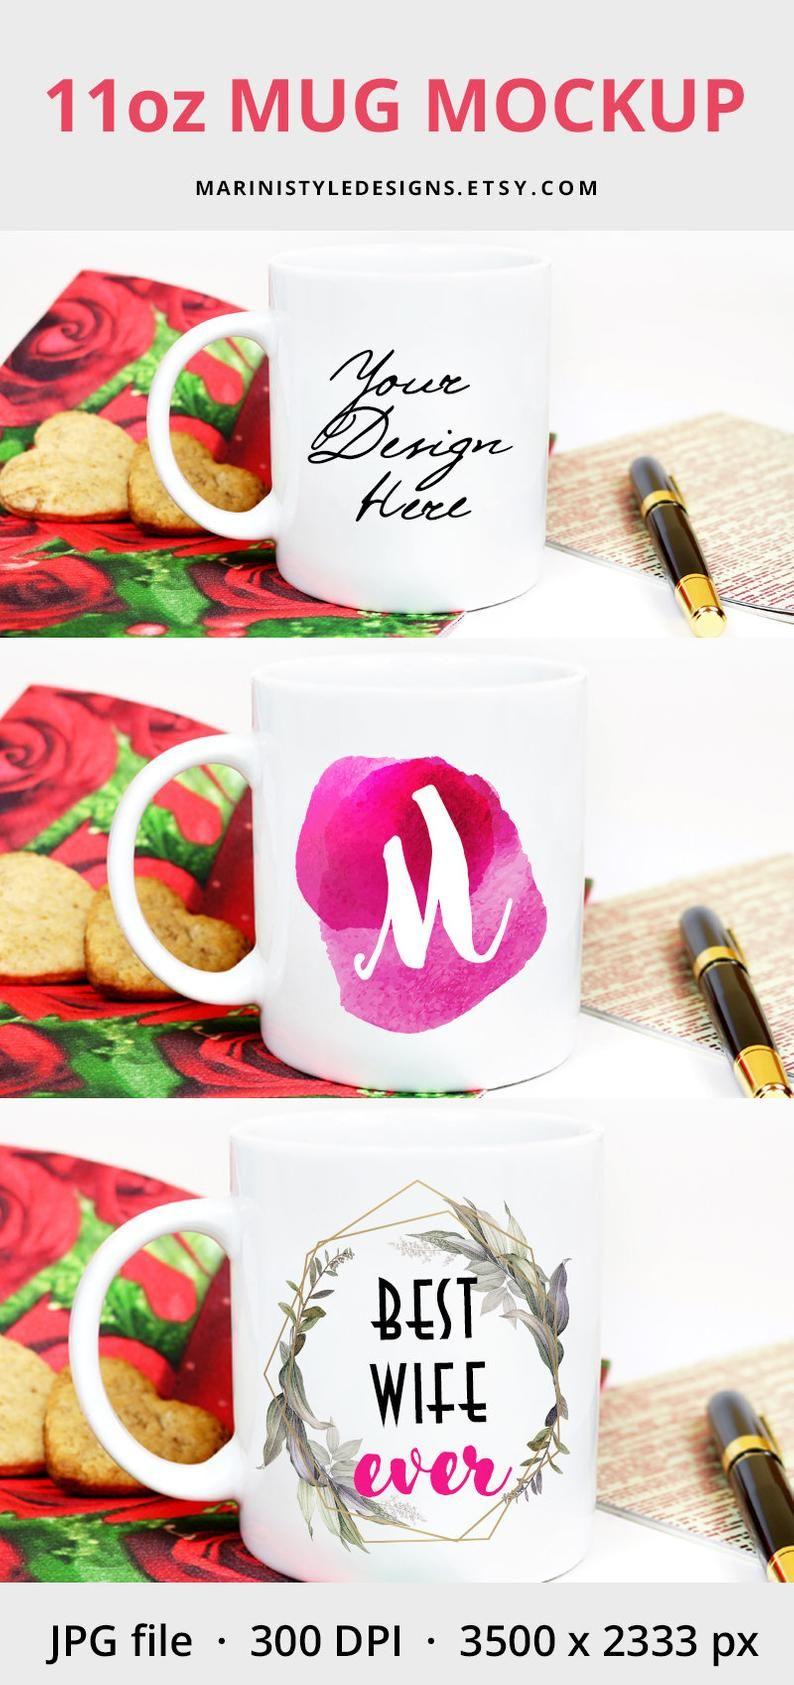 Romantic 11oz Coffee Mug Mockup For Valentines Day White Mug Mockup On Romantic Red Background 11oz Coffee Cup Mockup Photo Of Mug 315 Red Background Graphic Design Software Personalized Mugs